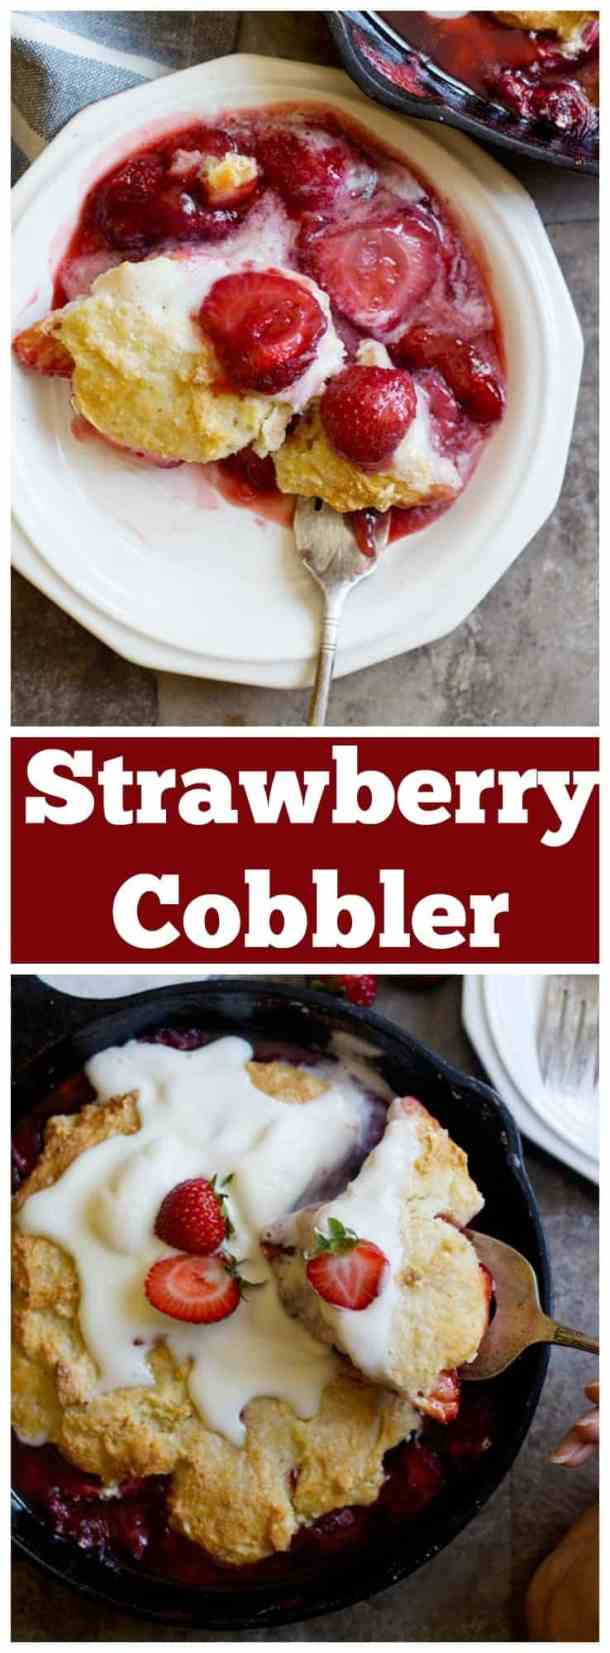 Strawberry cobbler | cobbler recipe | summer recipe | Strawberry recipe | Easy cobbler recipe | Homemade strawberry cobbler | #cobbler #summerrecipes #strawberries #strawberryrecipes